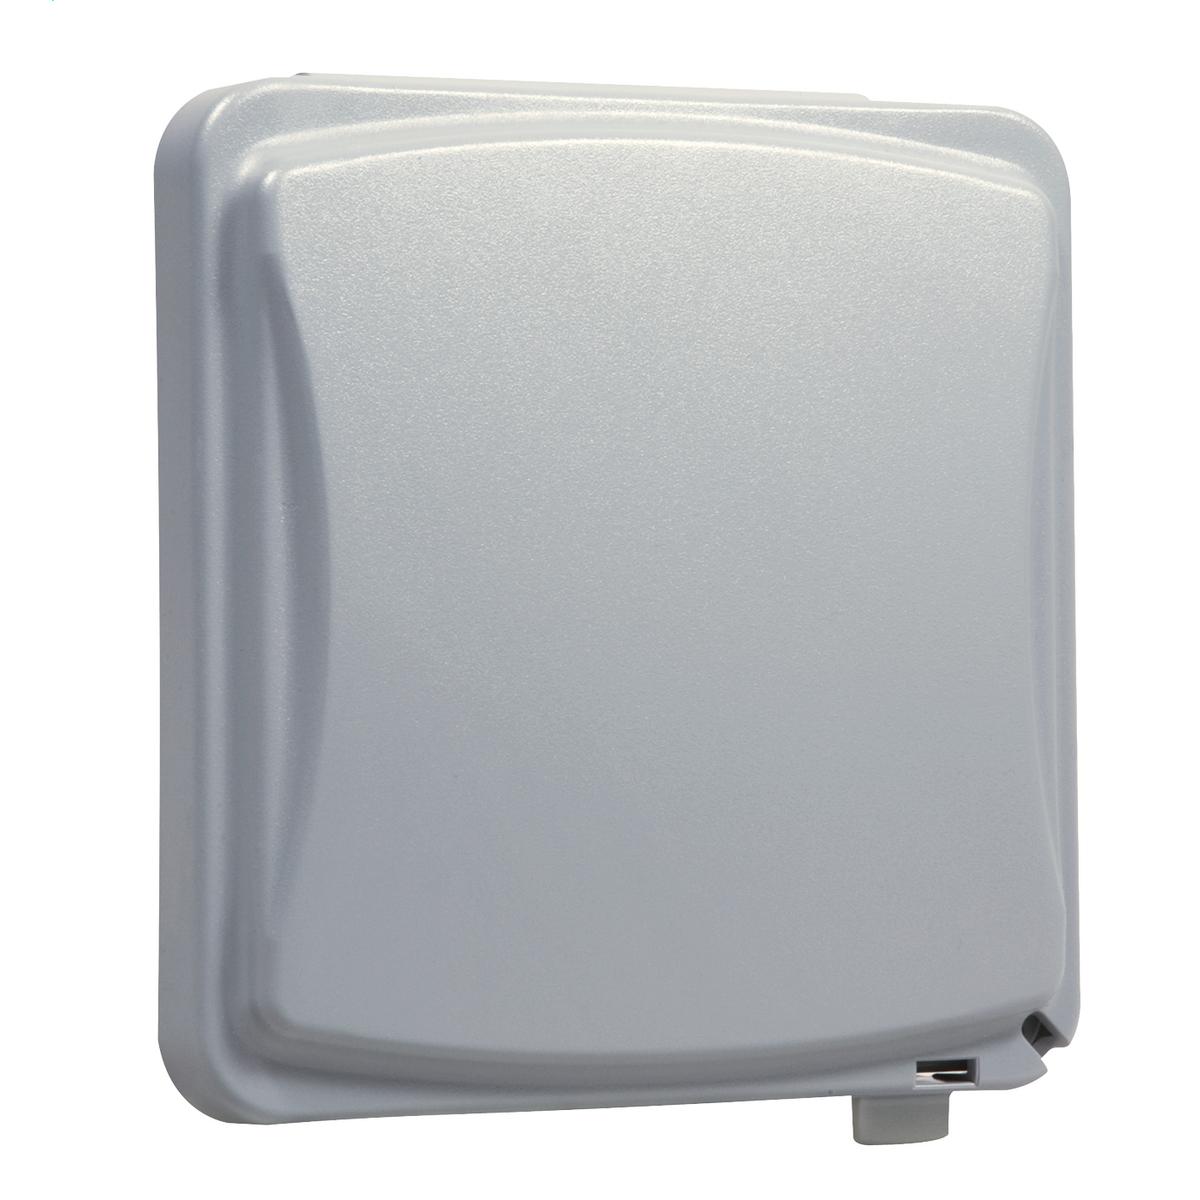 TayMac Single Gang Retangular Polycarbonate Gray Weatherproof Outdoor Box Flip